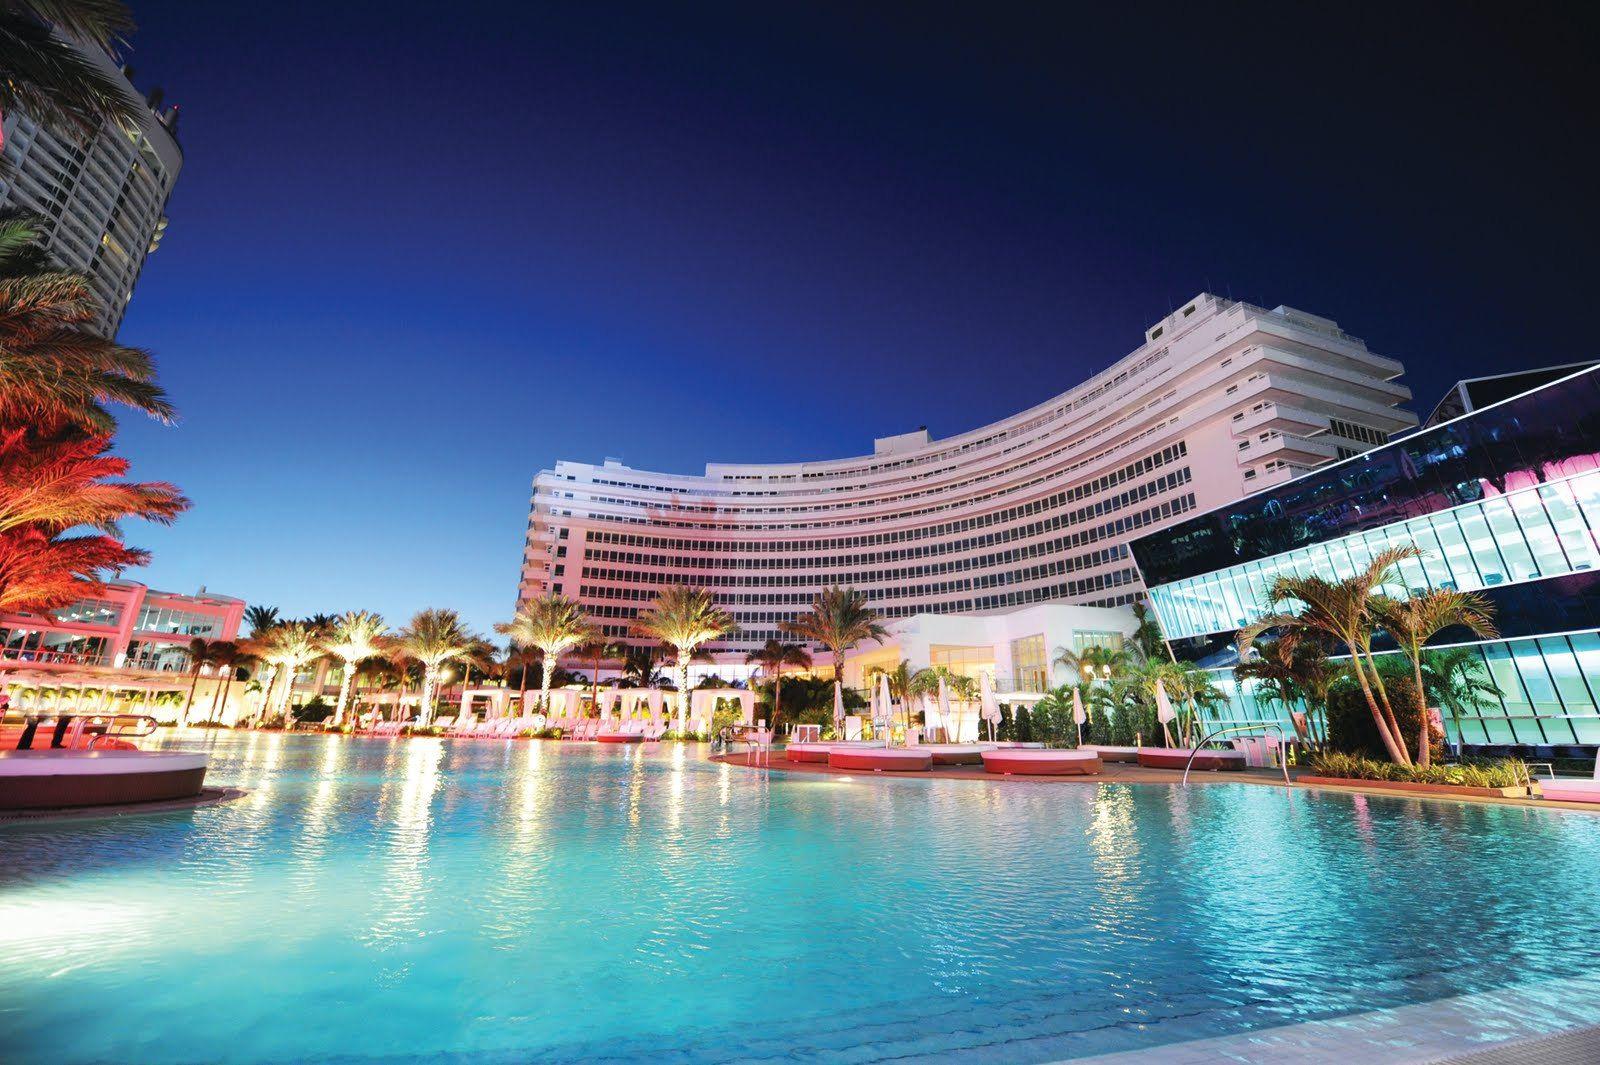 Fontainebleau Hotel Miami Beach Hd Widescreen Wallpaper